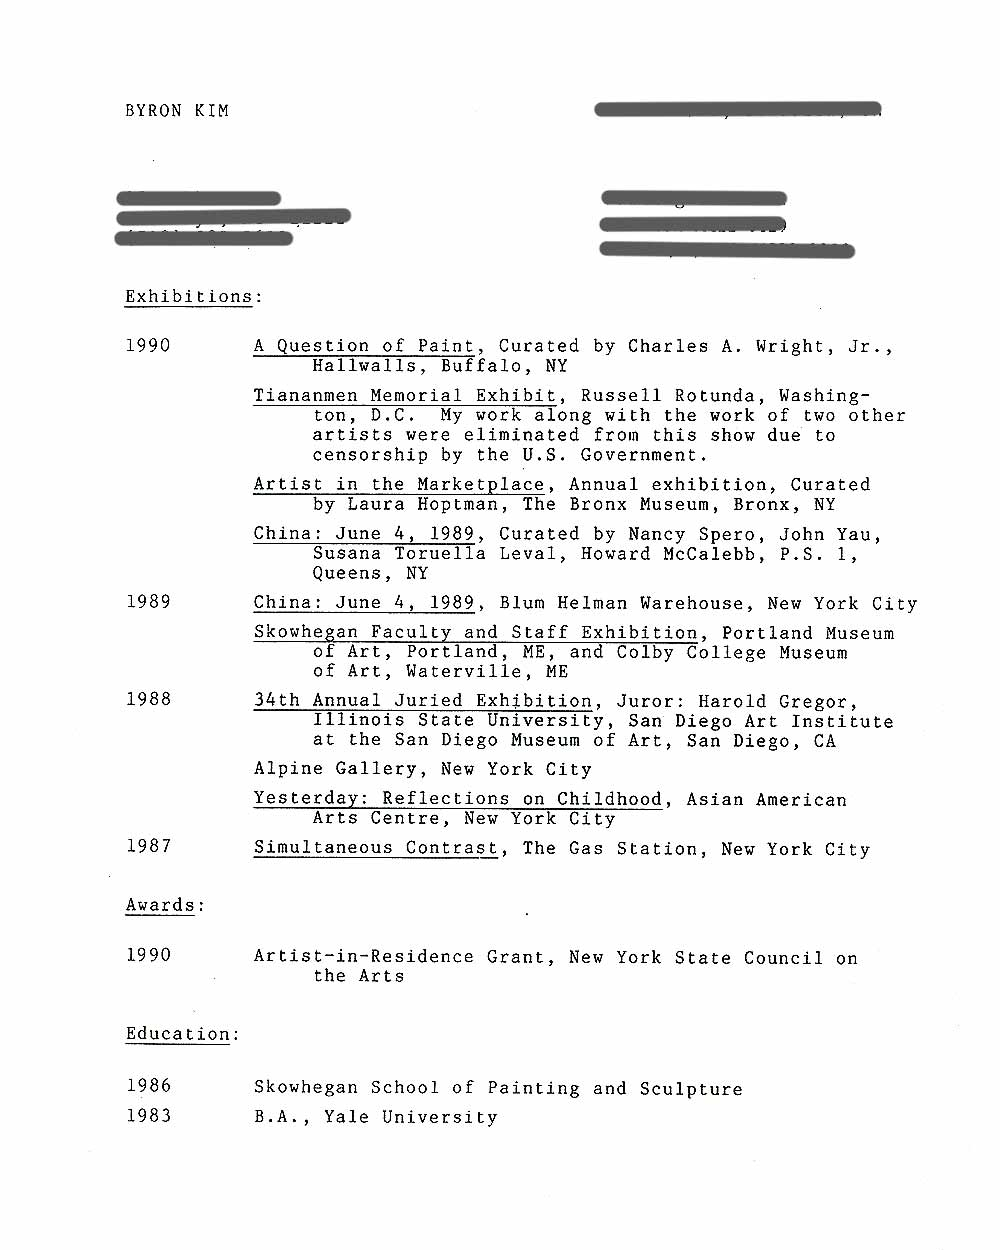 Byron Kim's Resume